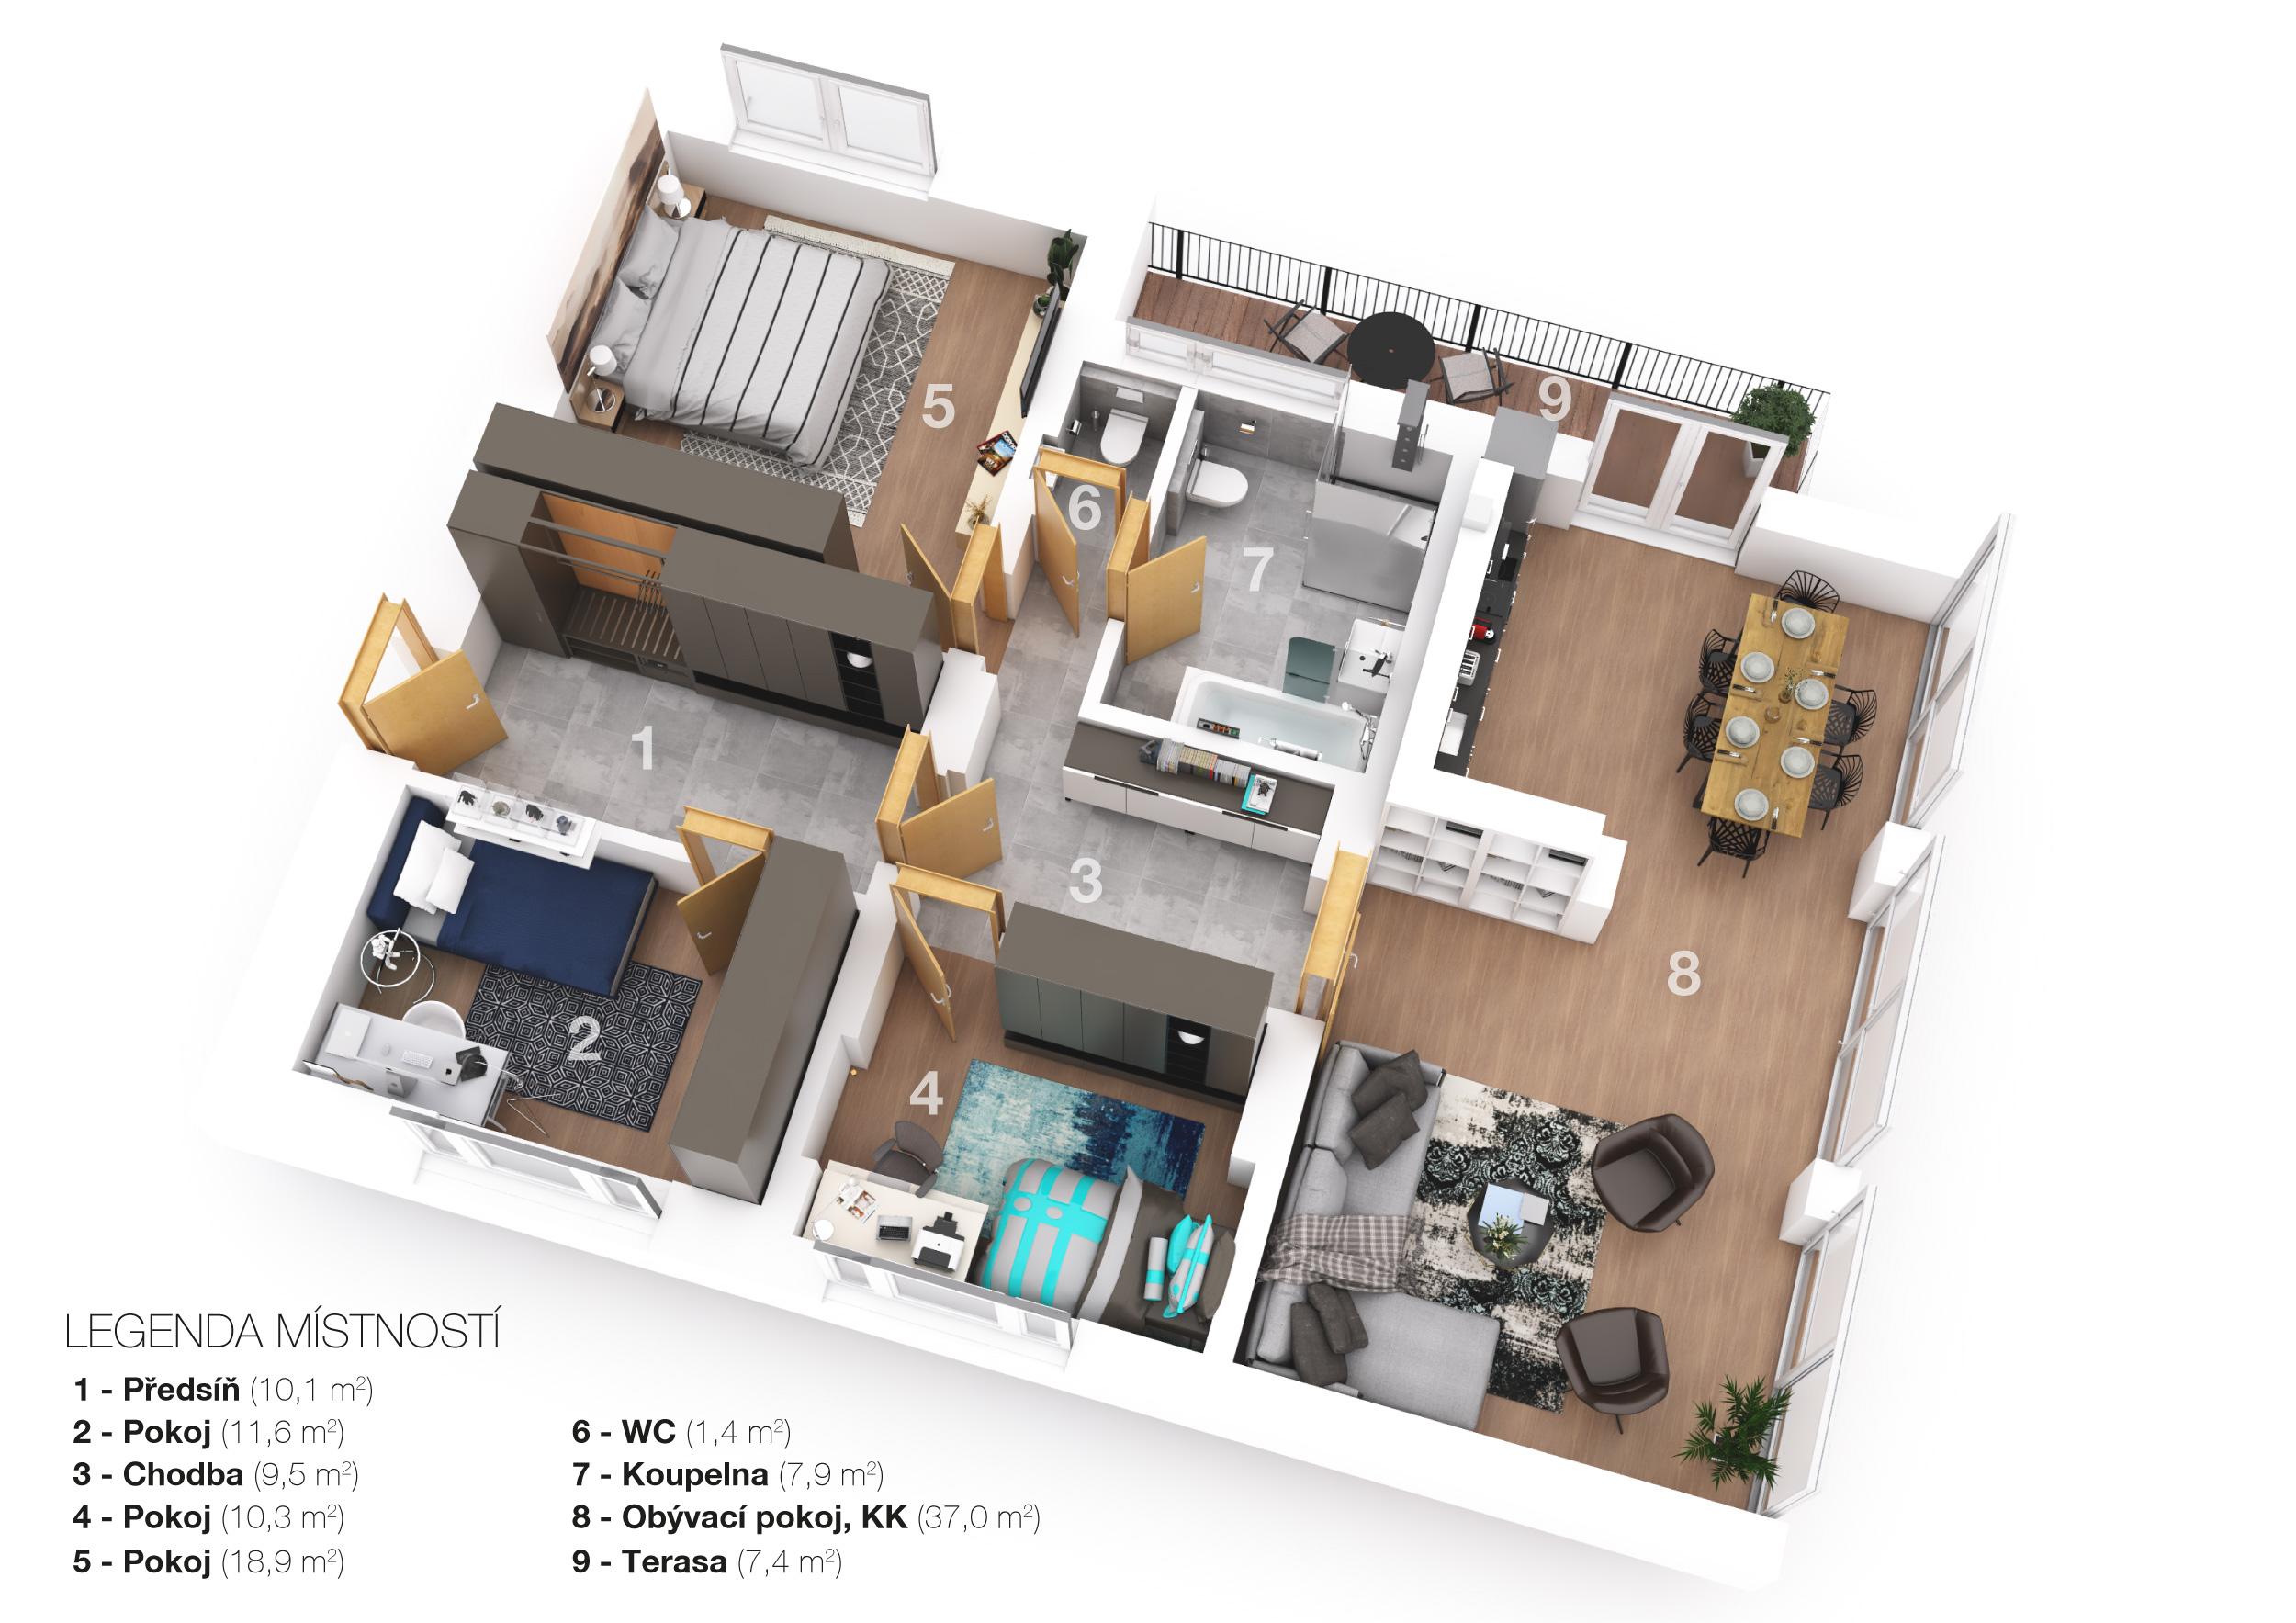 https://viladumrepublika.cz/wp-content/uploads/2021/05/3D-layout-A1.jpg